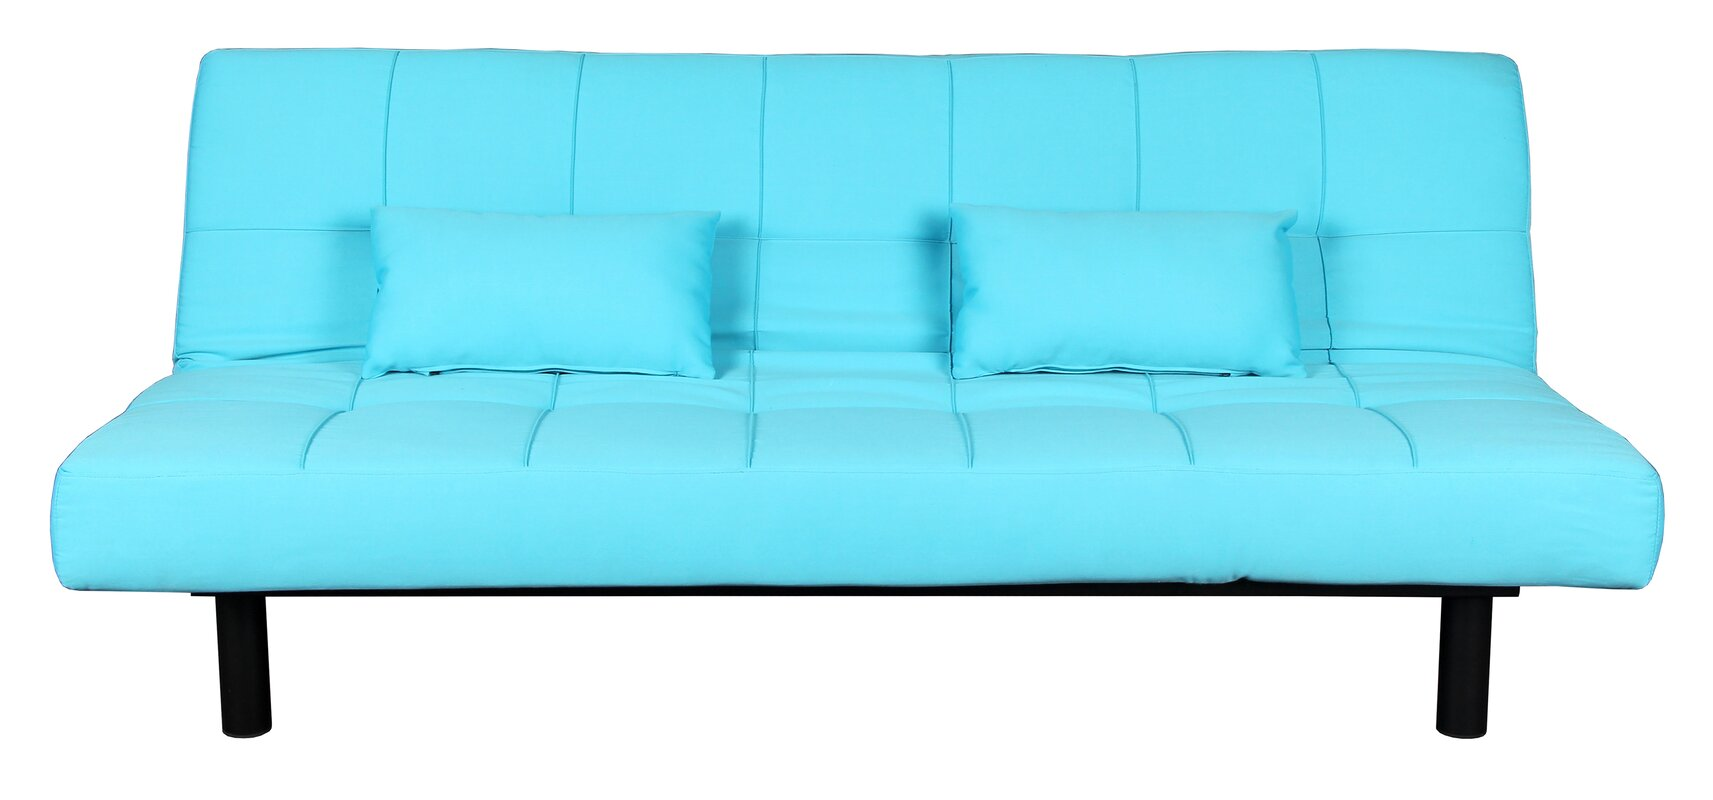 Contemporary Convertible Sofa Best Convertible Sofas Best